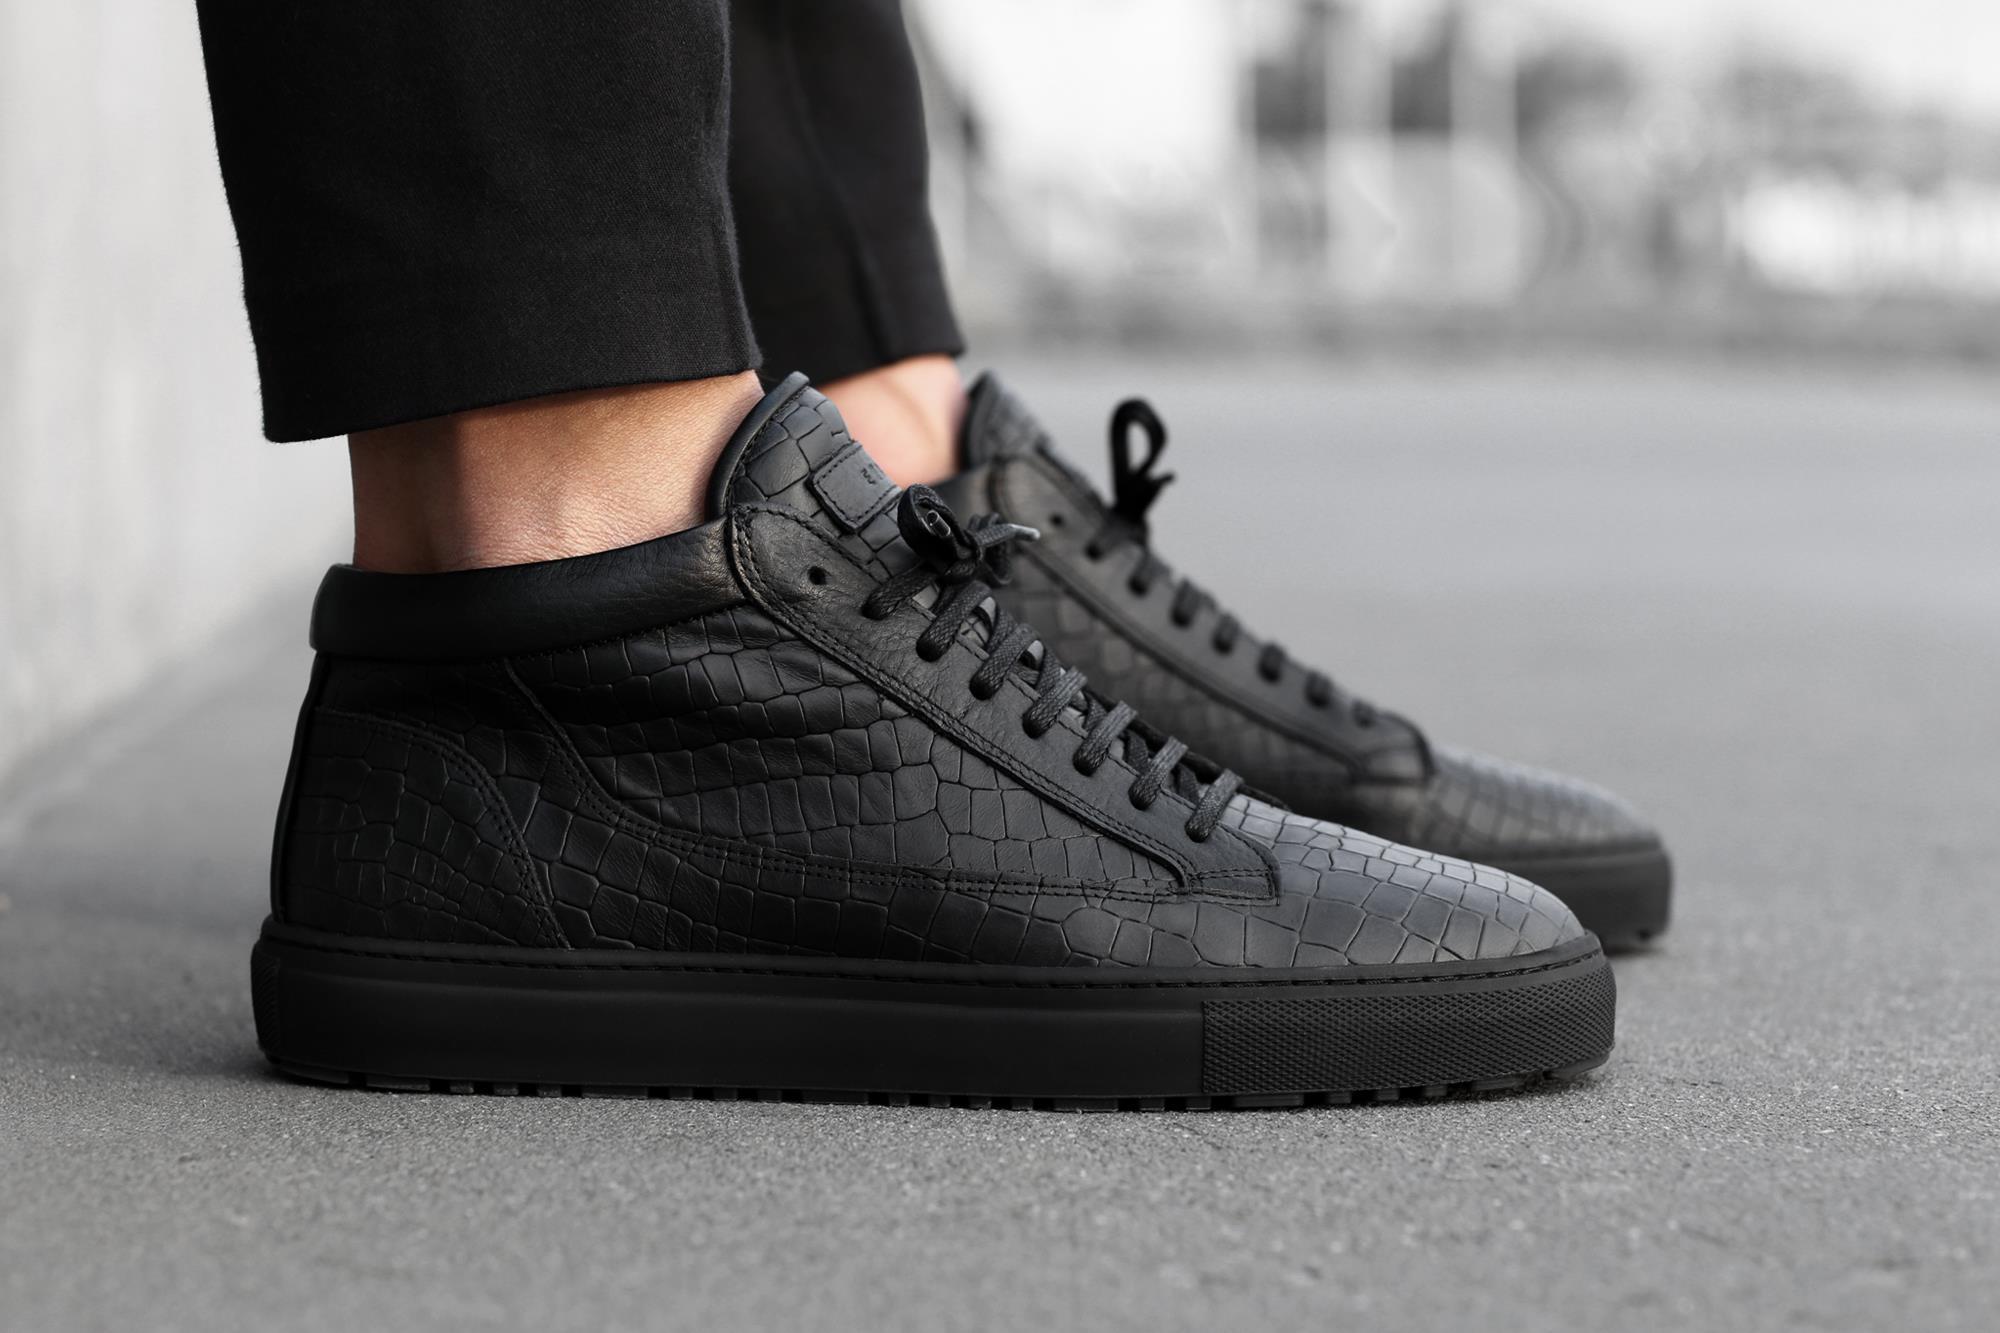 Etq. Etq. Mid-top Sneakers - Black Chaussures De Sport Mi-top - Noir uVYBJ